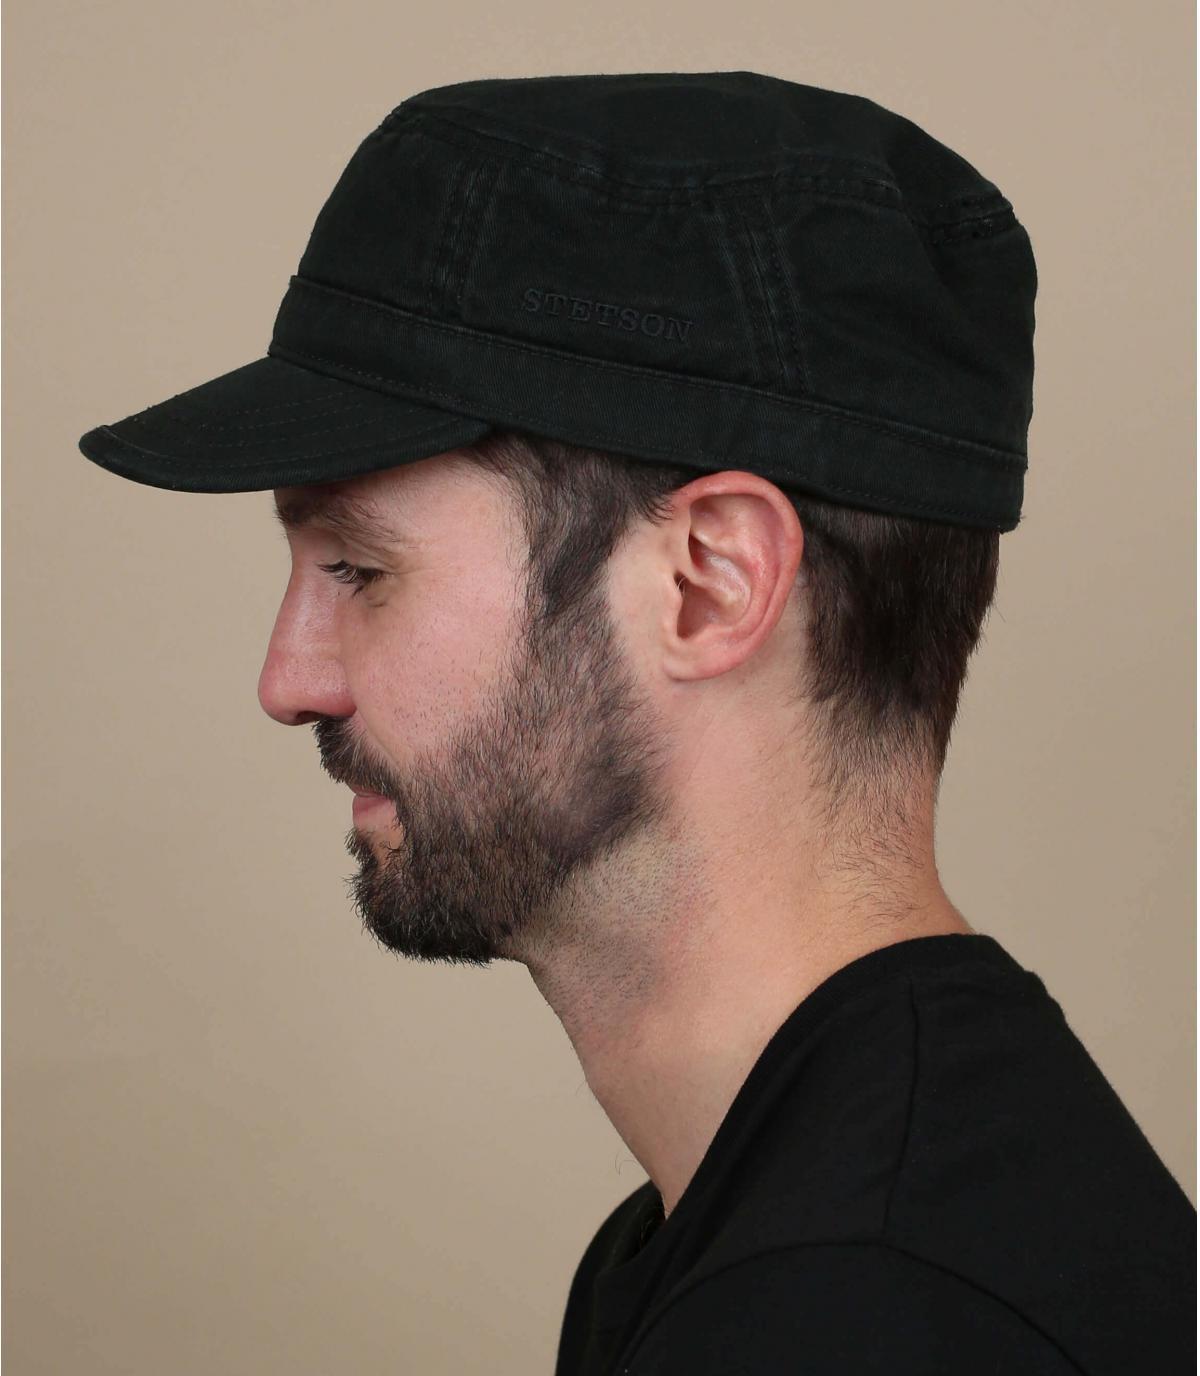 Basic army cap stetson